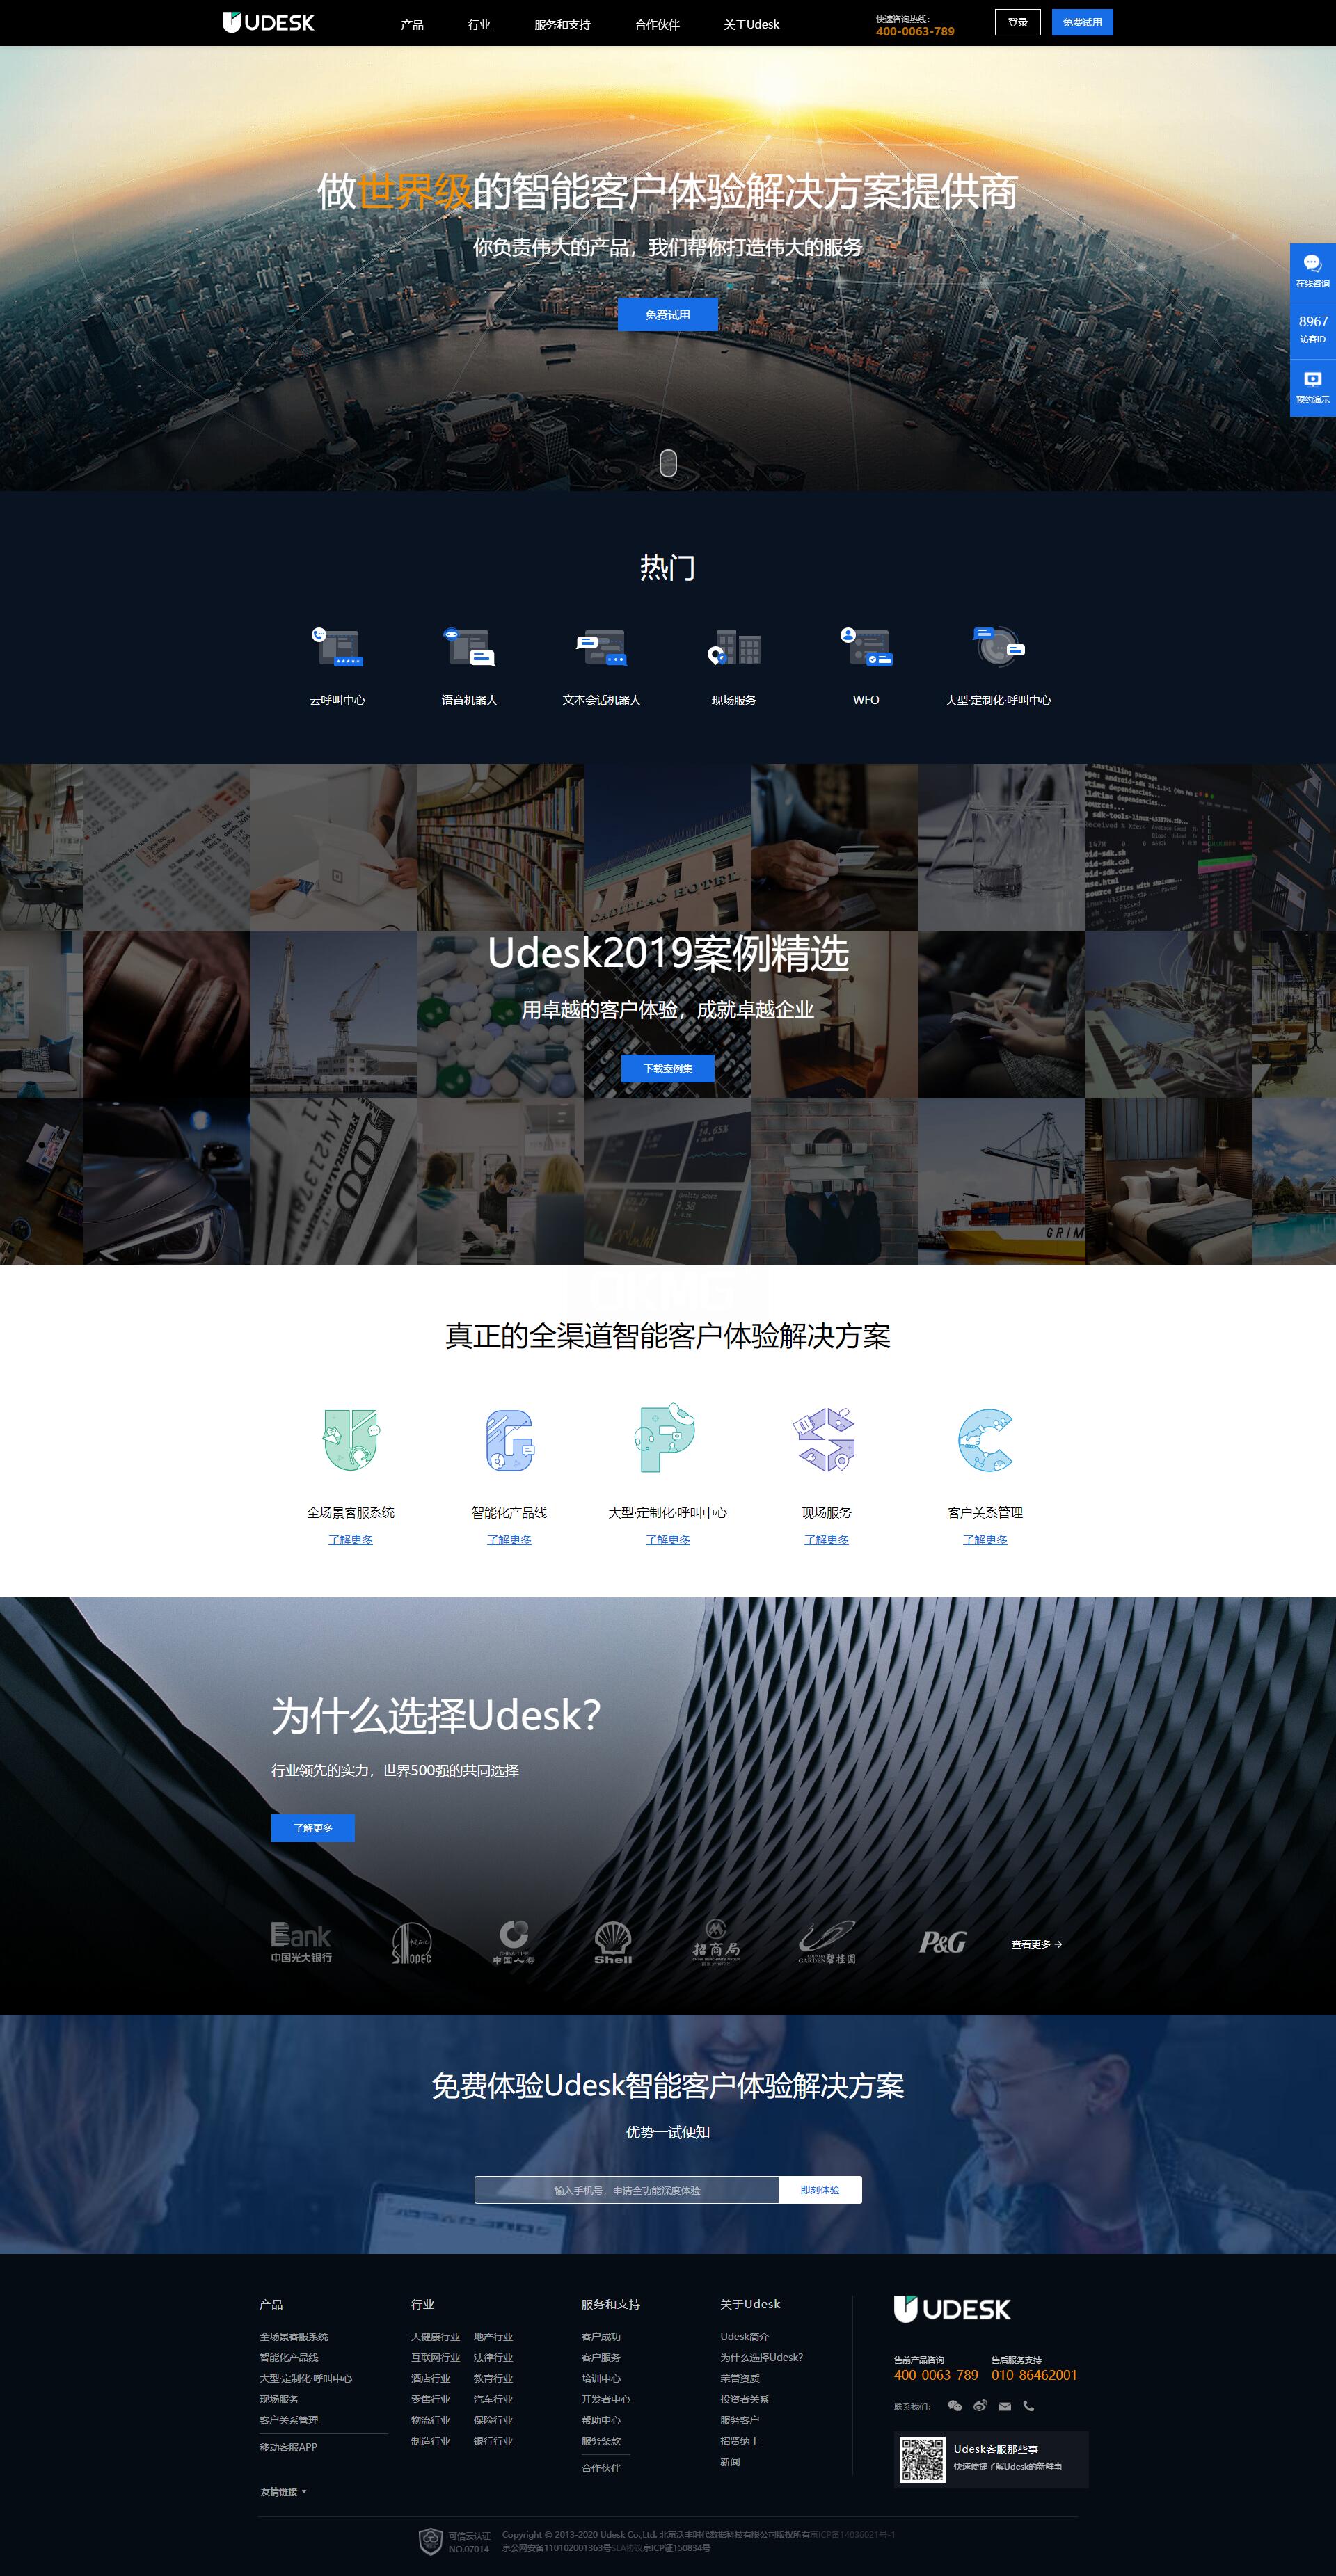 Udesk[官网]-国内专业在线客服系统|呼叫中心|工单管理系统|做世界级的智能客户体验解决方案提供商